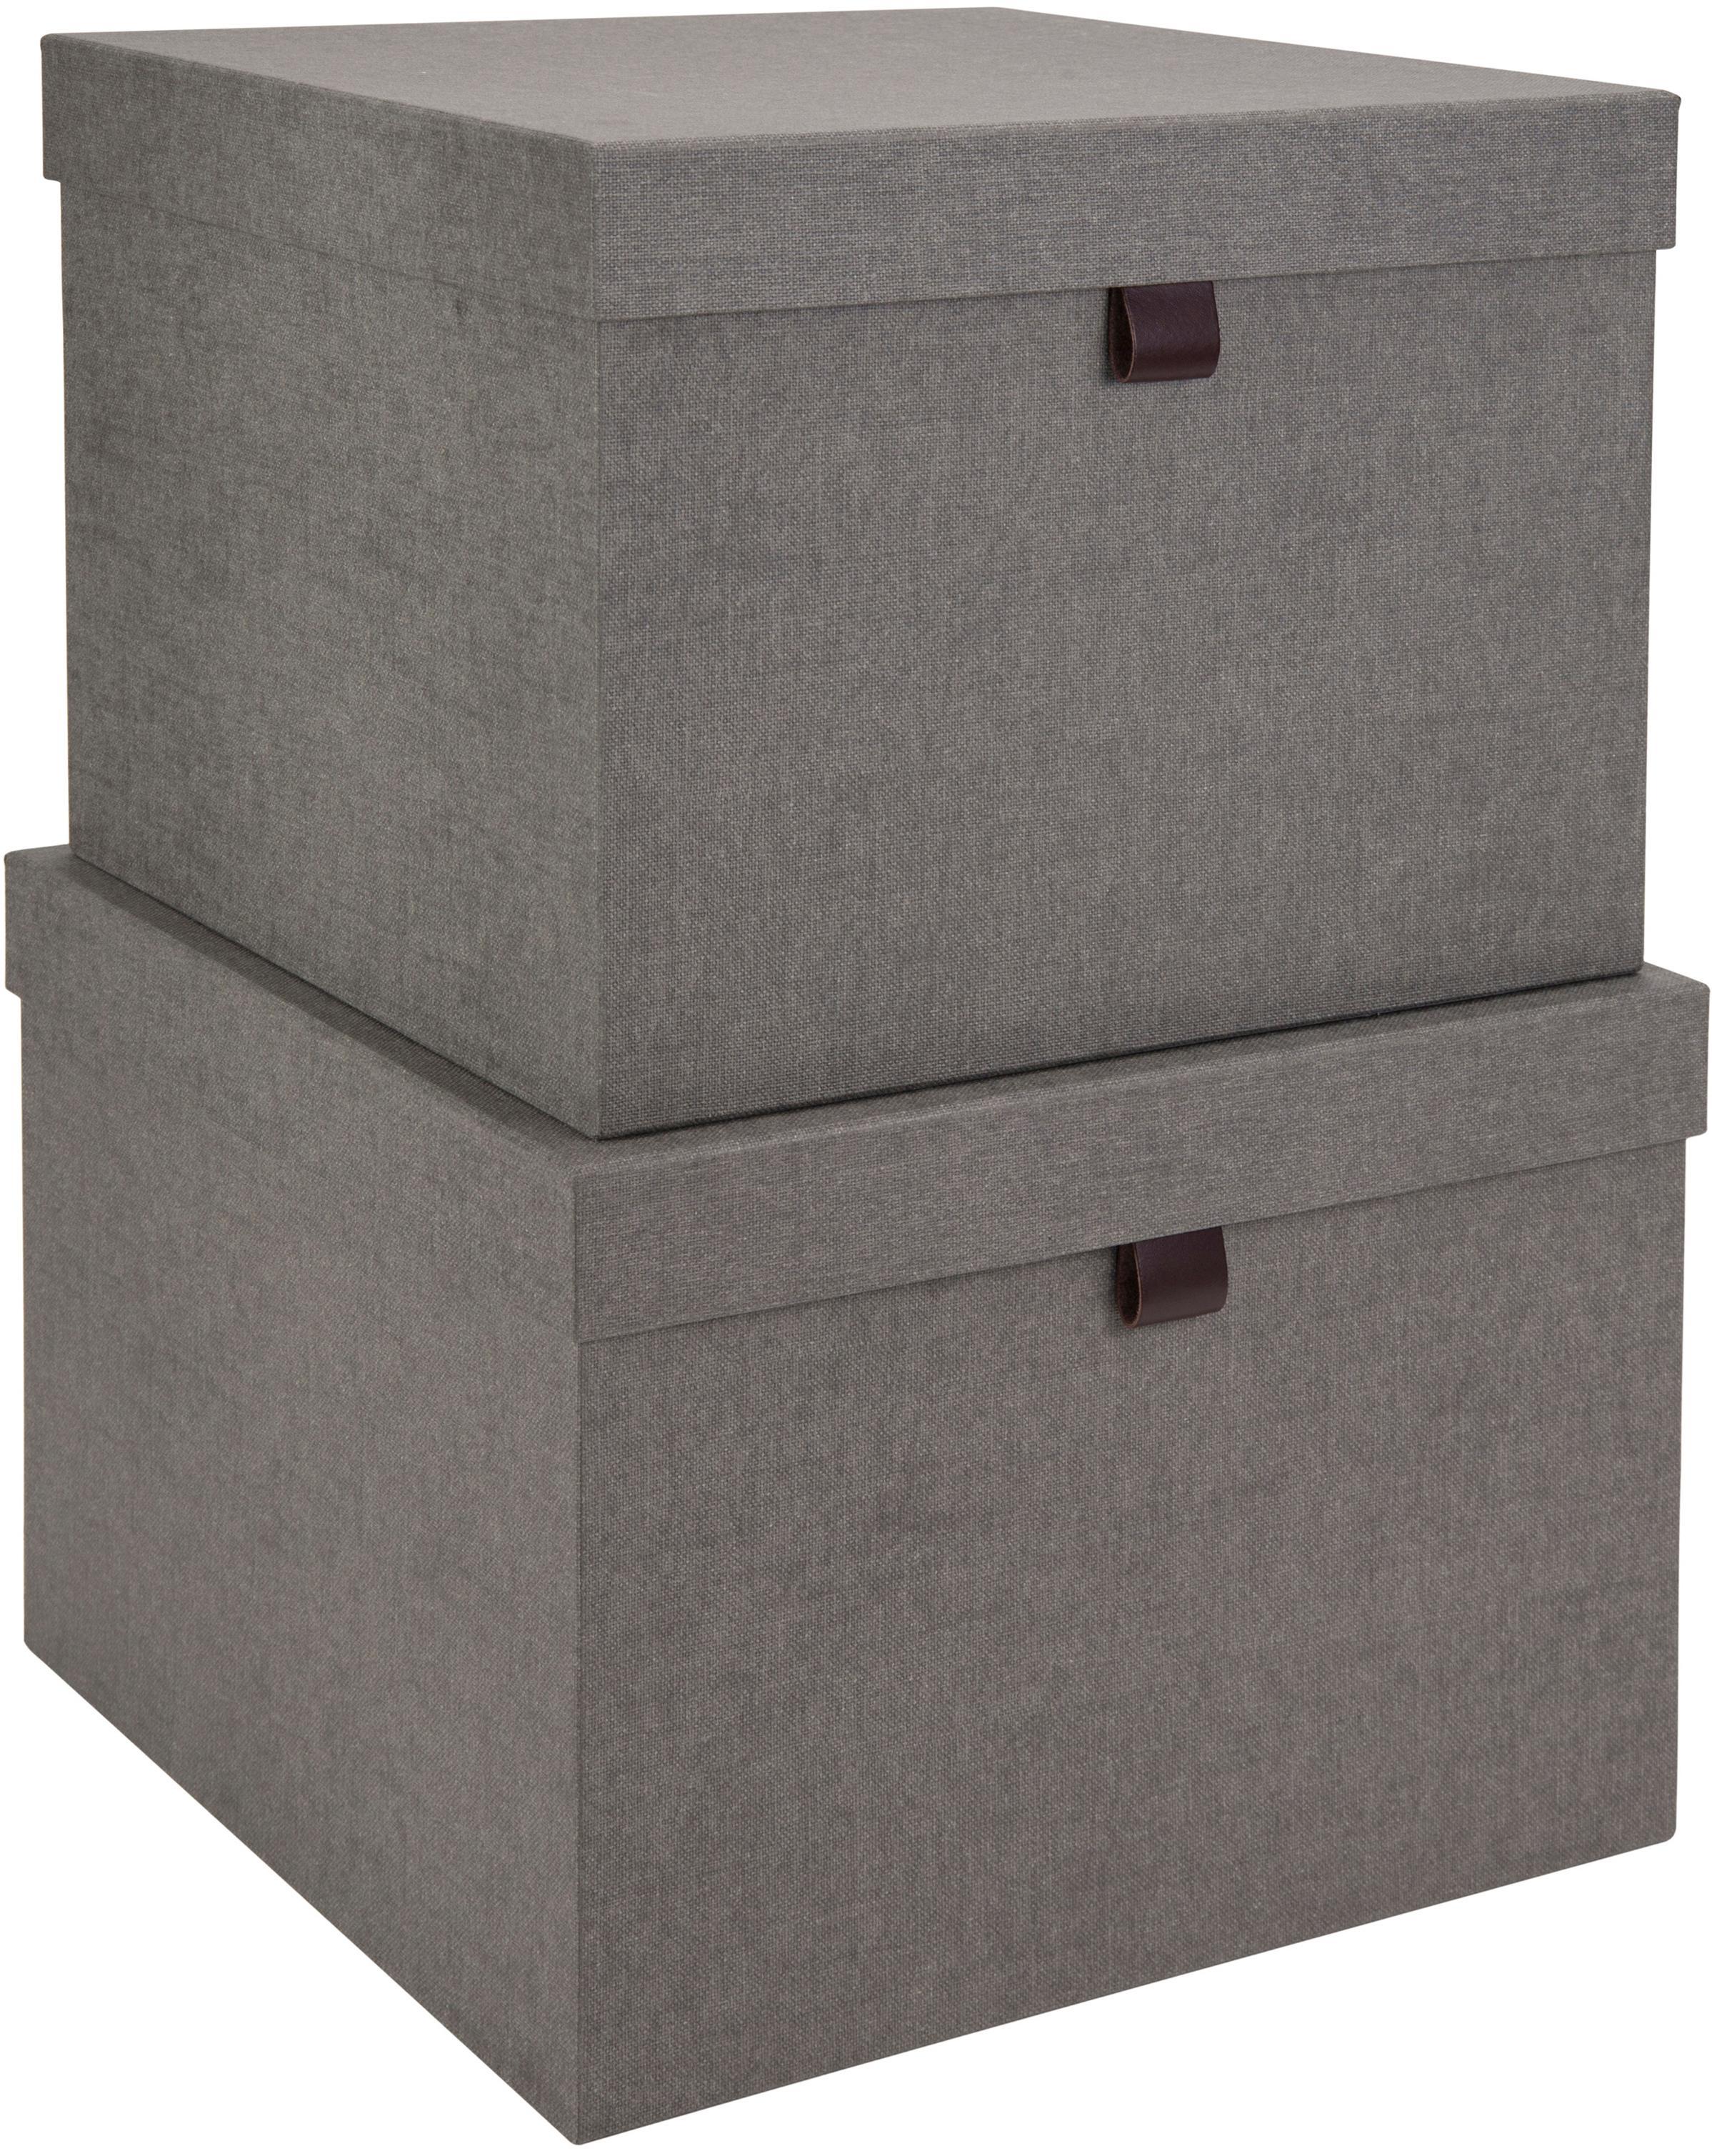 Set de cajas Tristan, 2pzas., Caja: cartón laminado, Gris, Tamaños diferentes